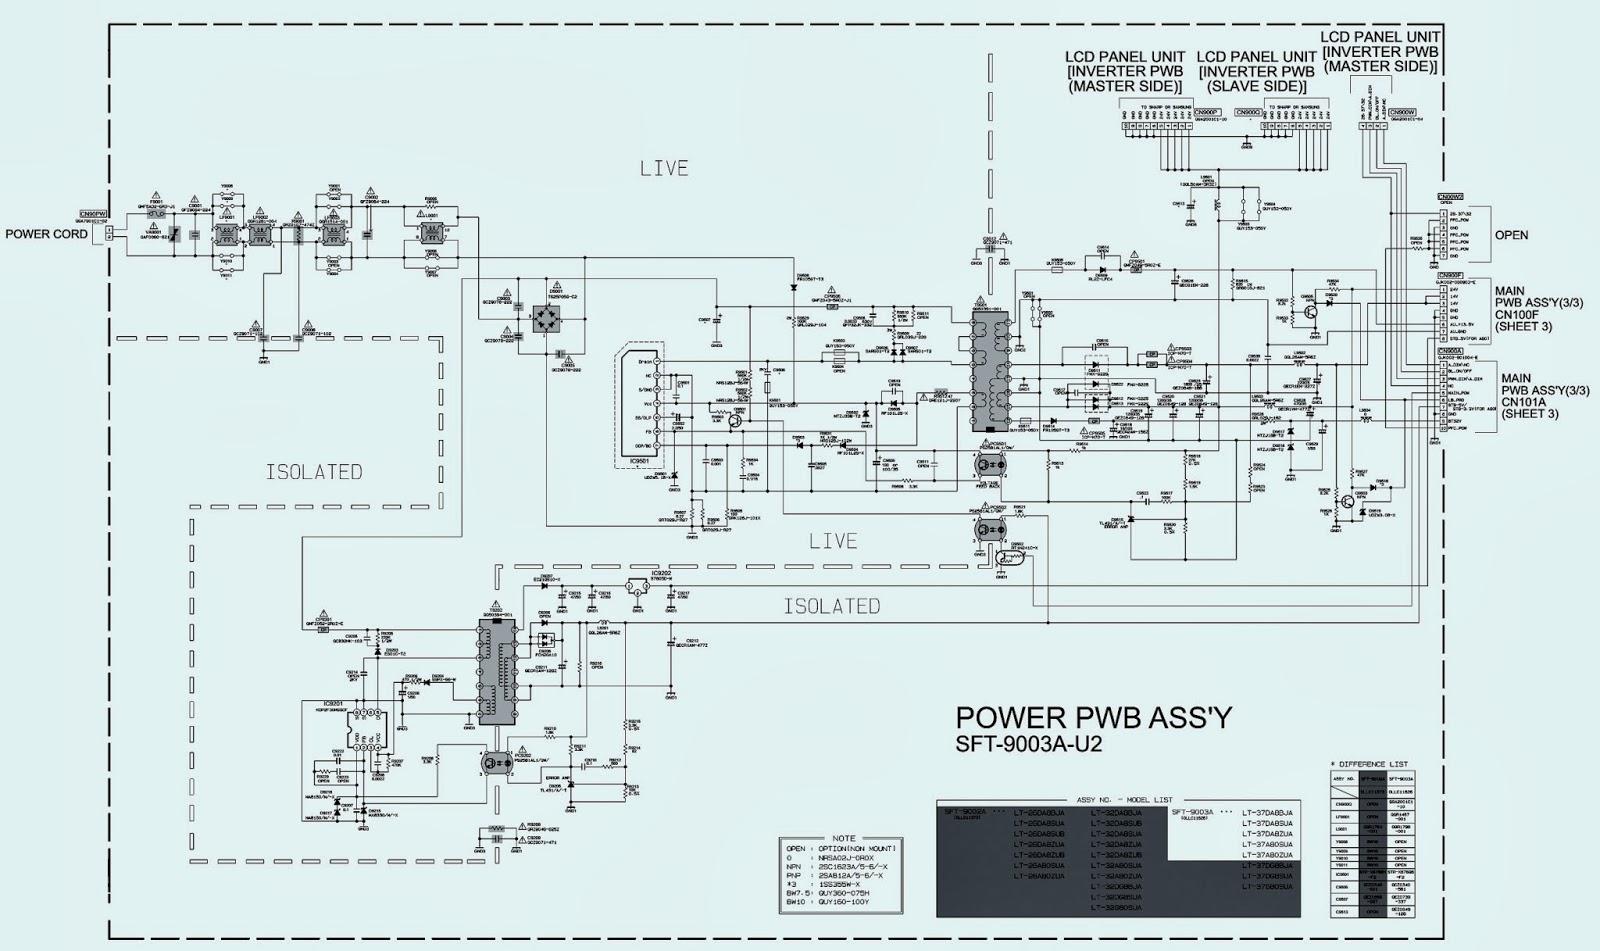 jvc tv diagram trusted wiring diagram online rh 18 perueckenstudio24 de electronic circuit diagrams tv circuit board parts [ 1600 x 951 Pixel ]